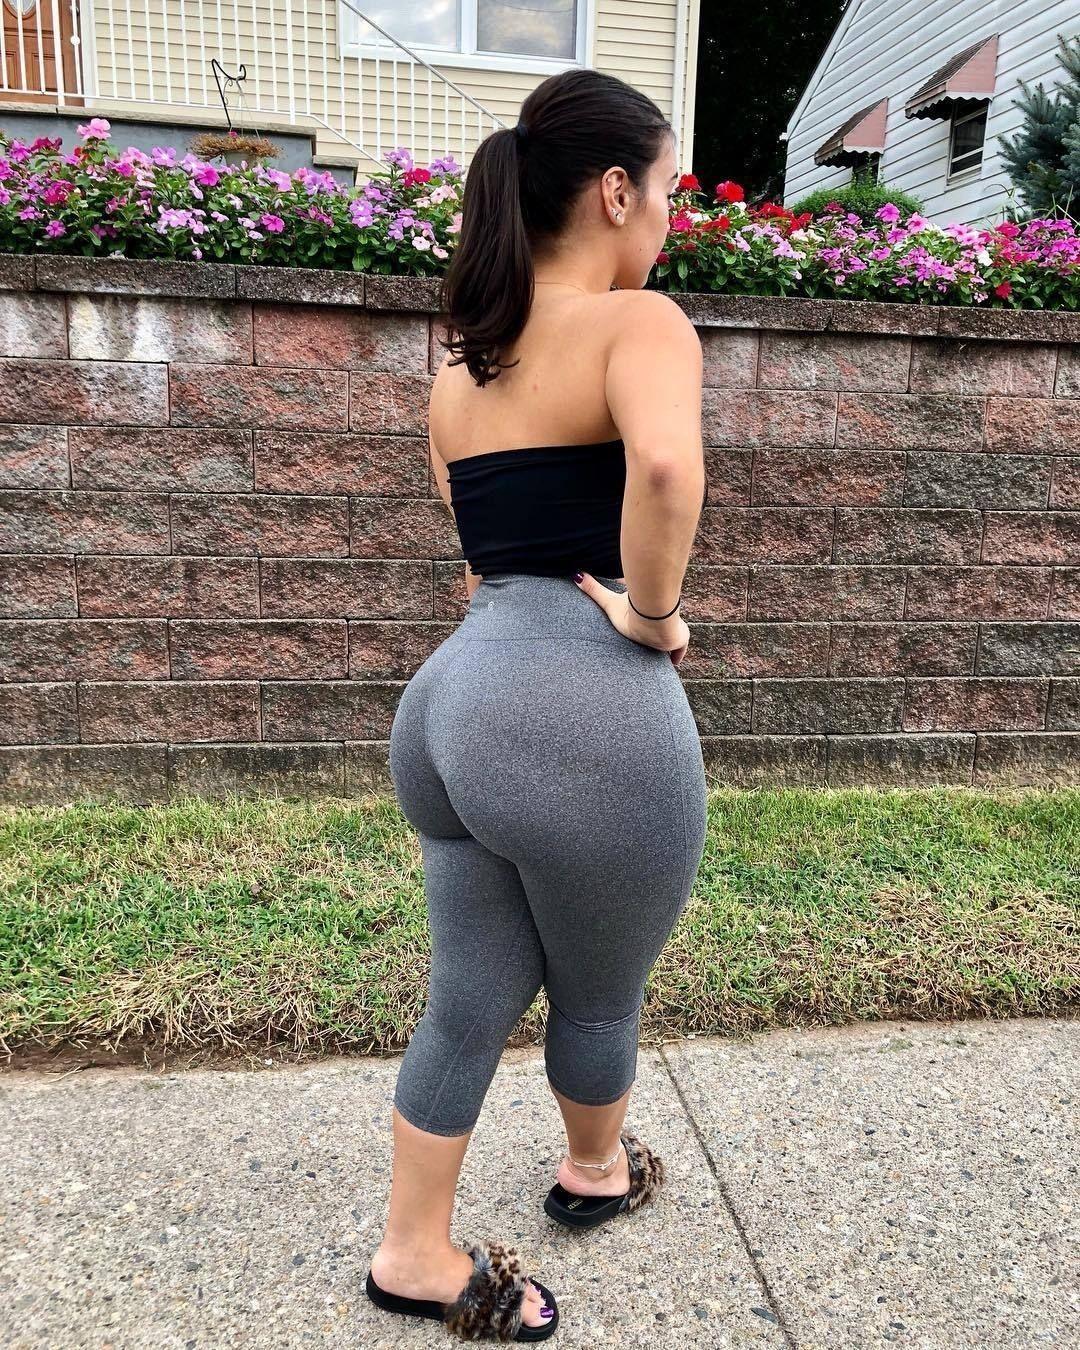 Big plus ass women